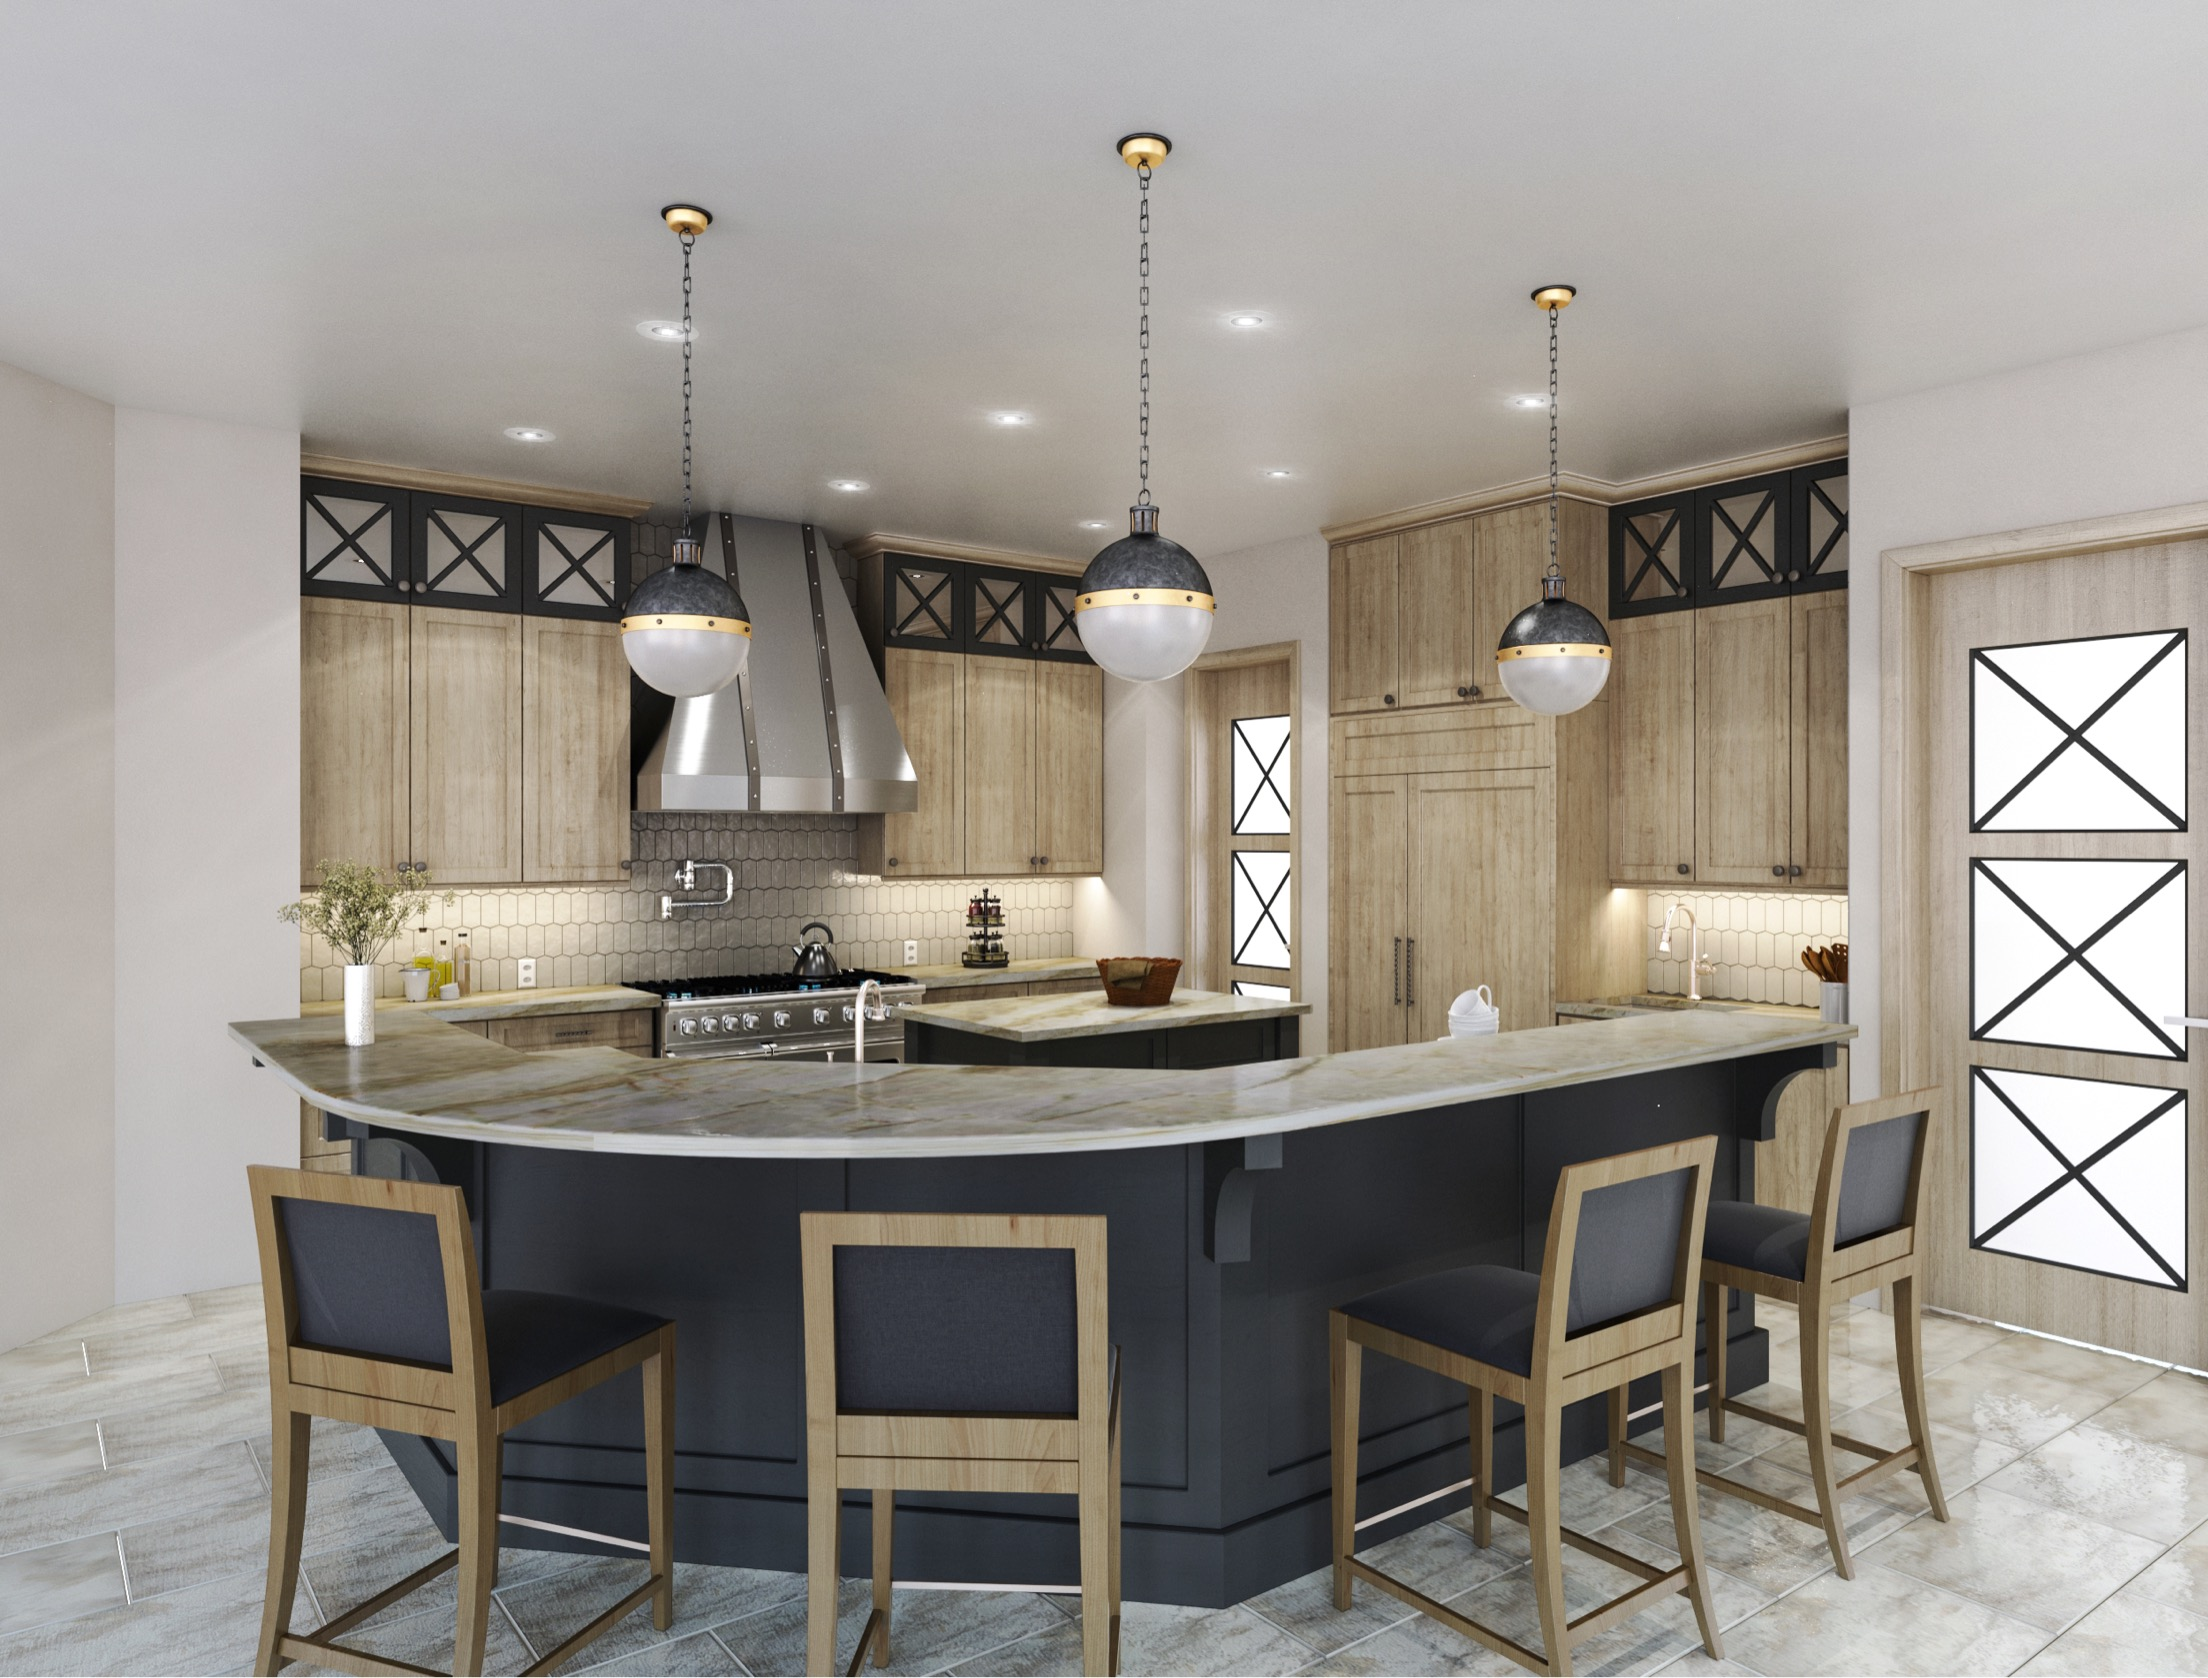 Proposed Kitchen Design - Carla Aston, Designer | #kitchendesign #kitchenideas #woodkitchen